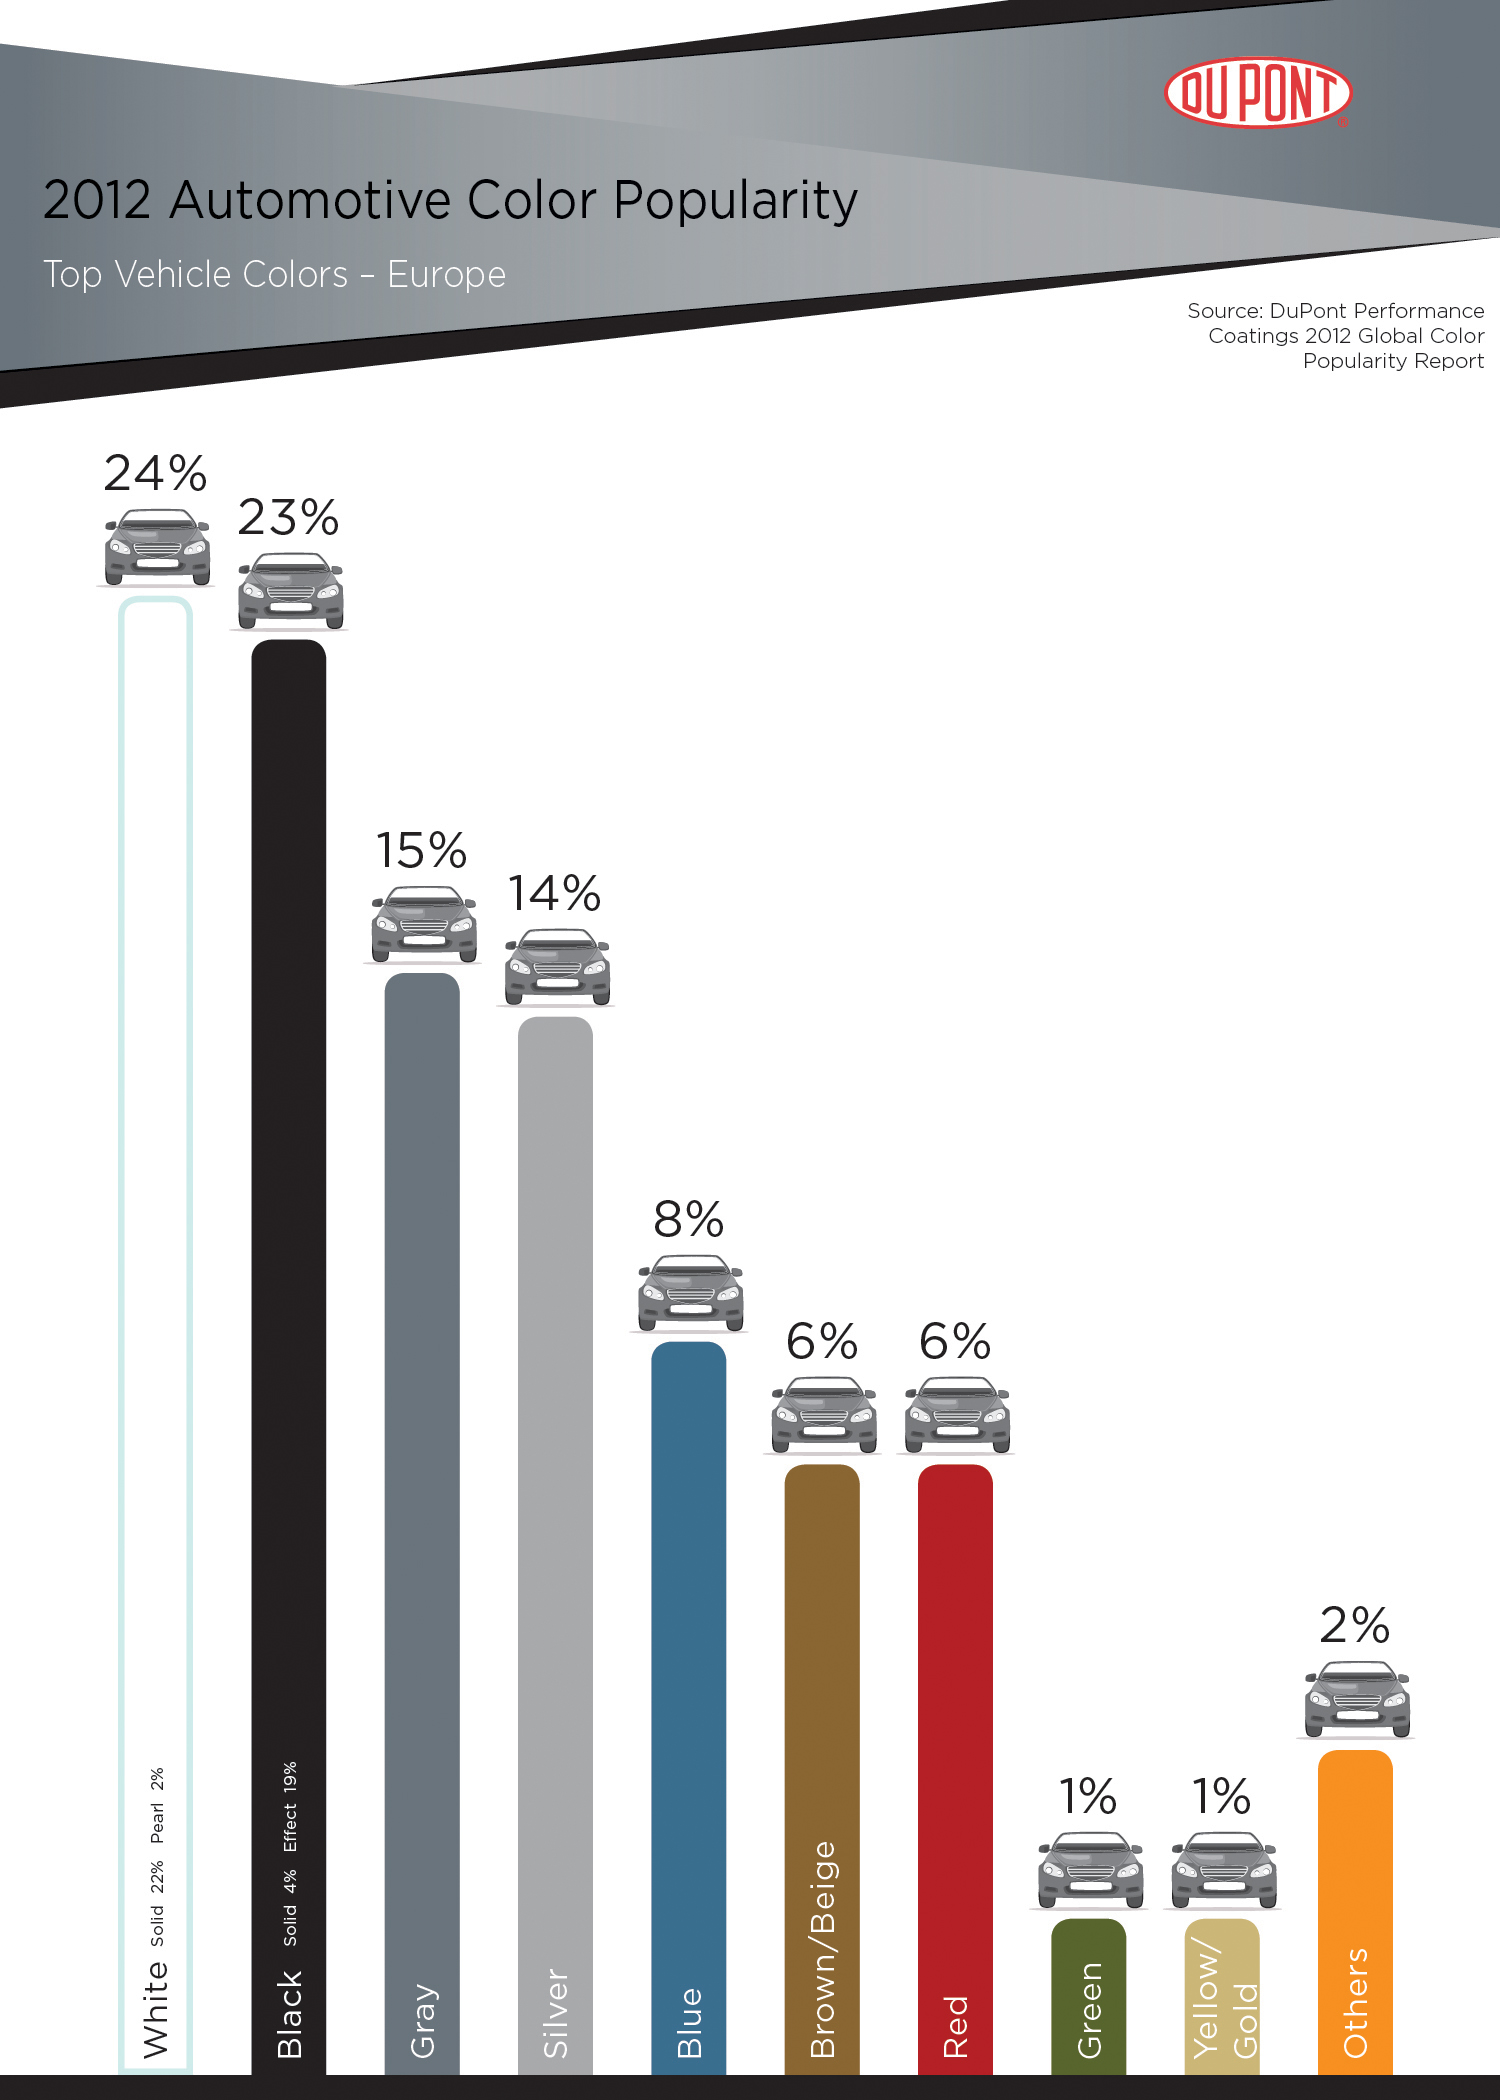 2012 dupont automotive color popularity report showcases global 2012 dupont automotive color popularity report europe nvjuhfo Choice Image